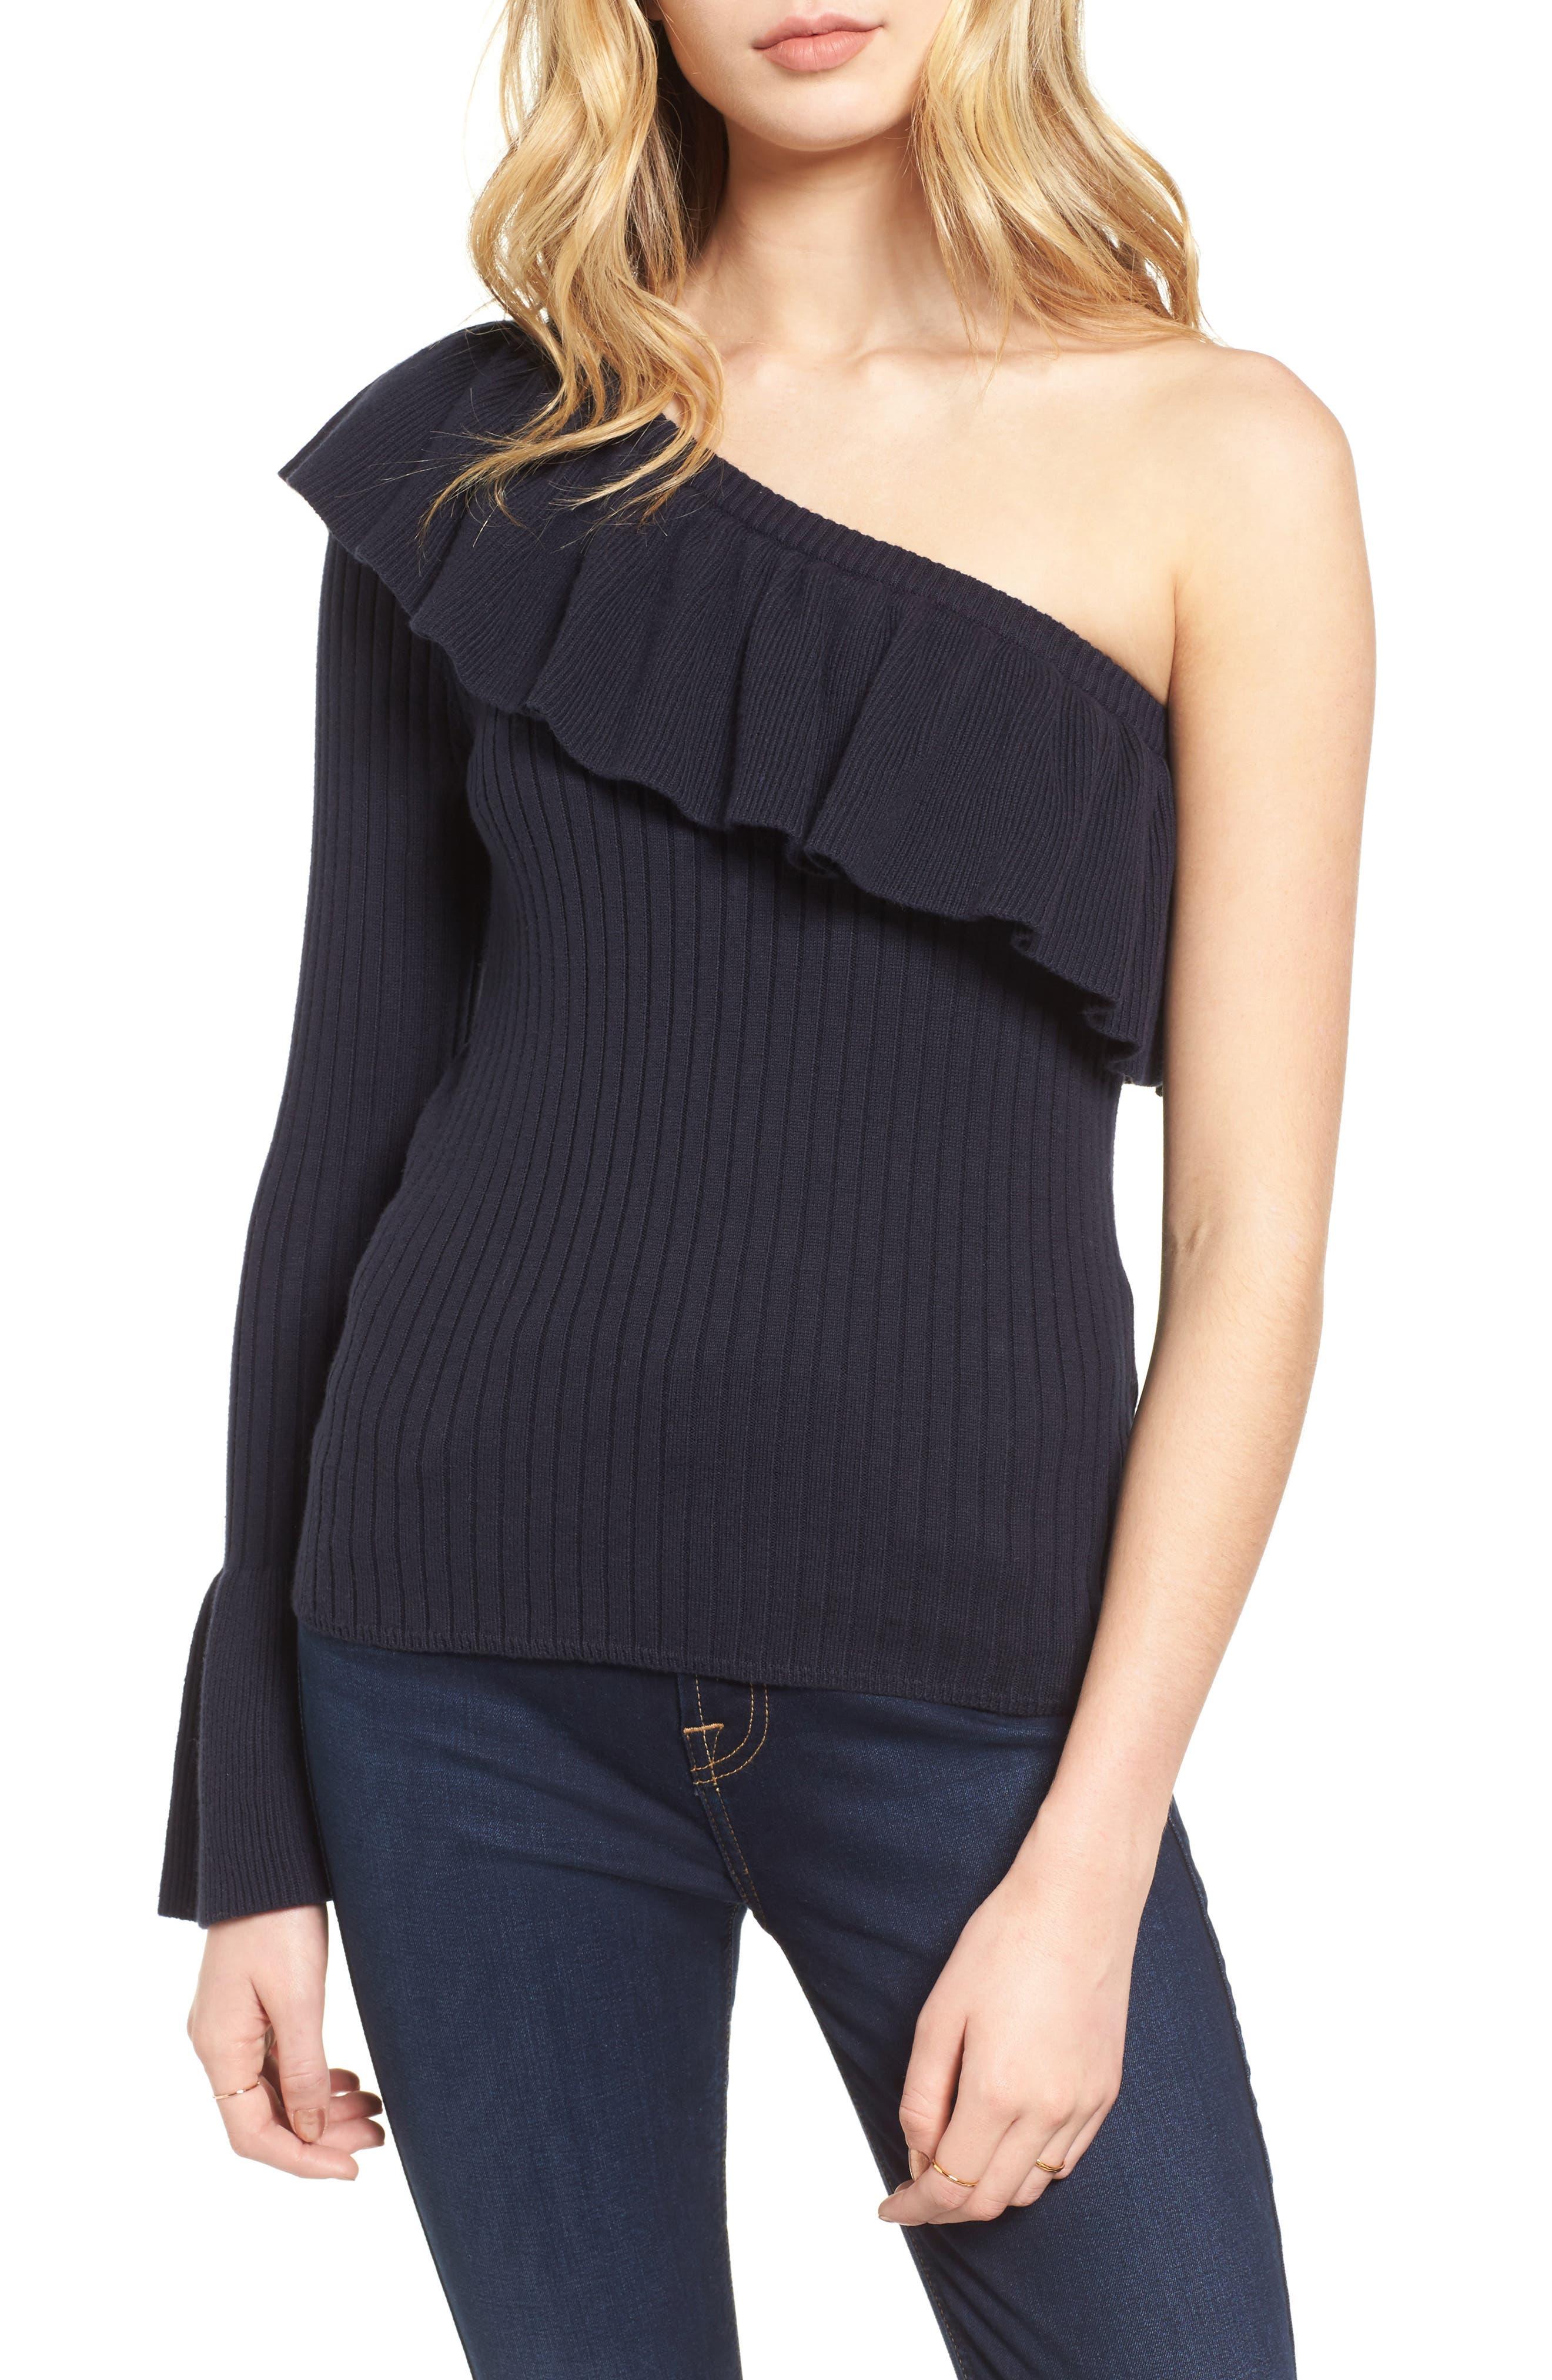 Ava One Shoulder Cotton & Cashmere Sweater,                         Main,                         color, Navy